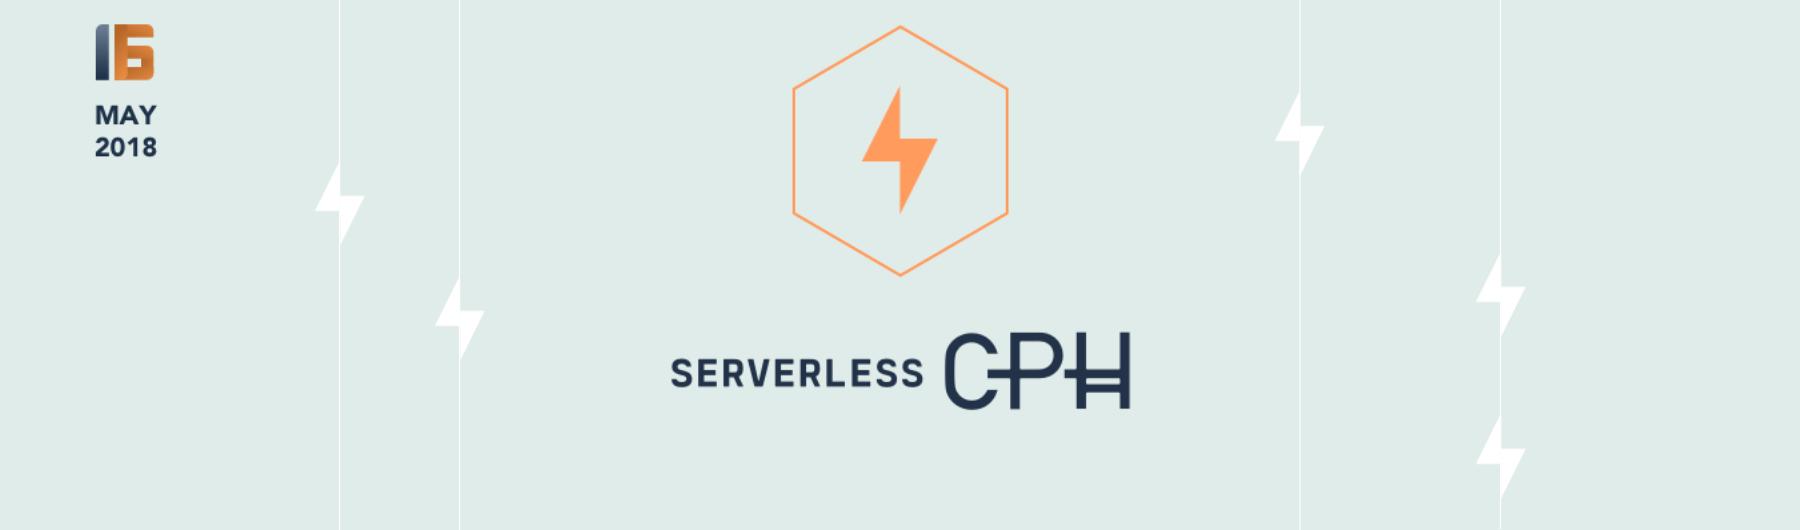 ServerlessCPH 2018